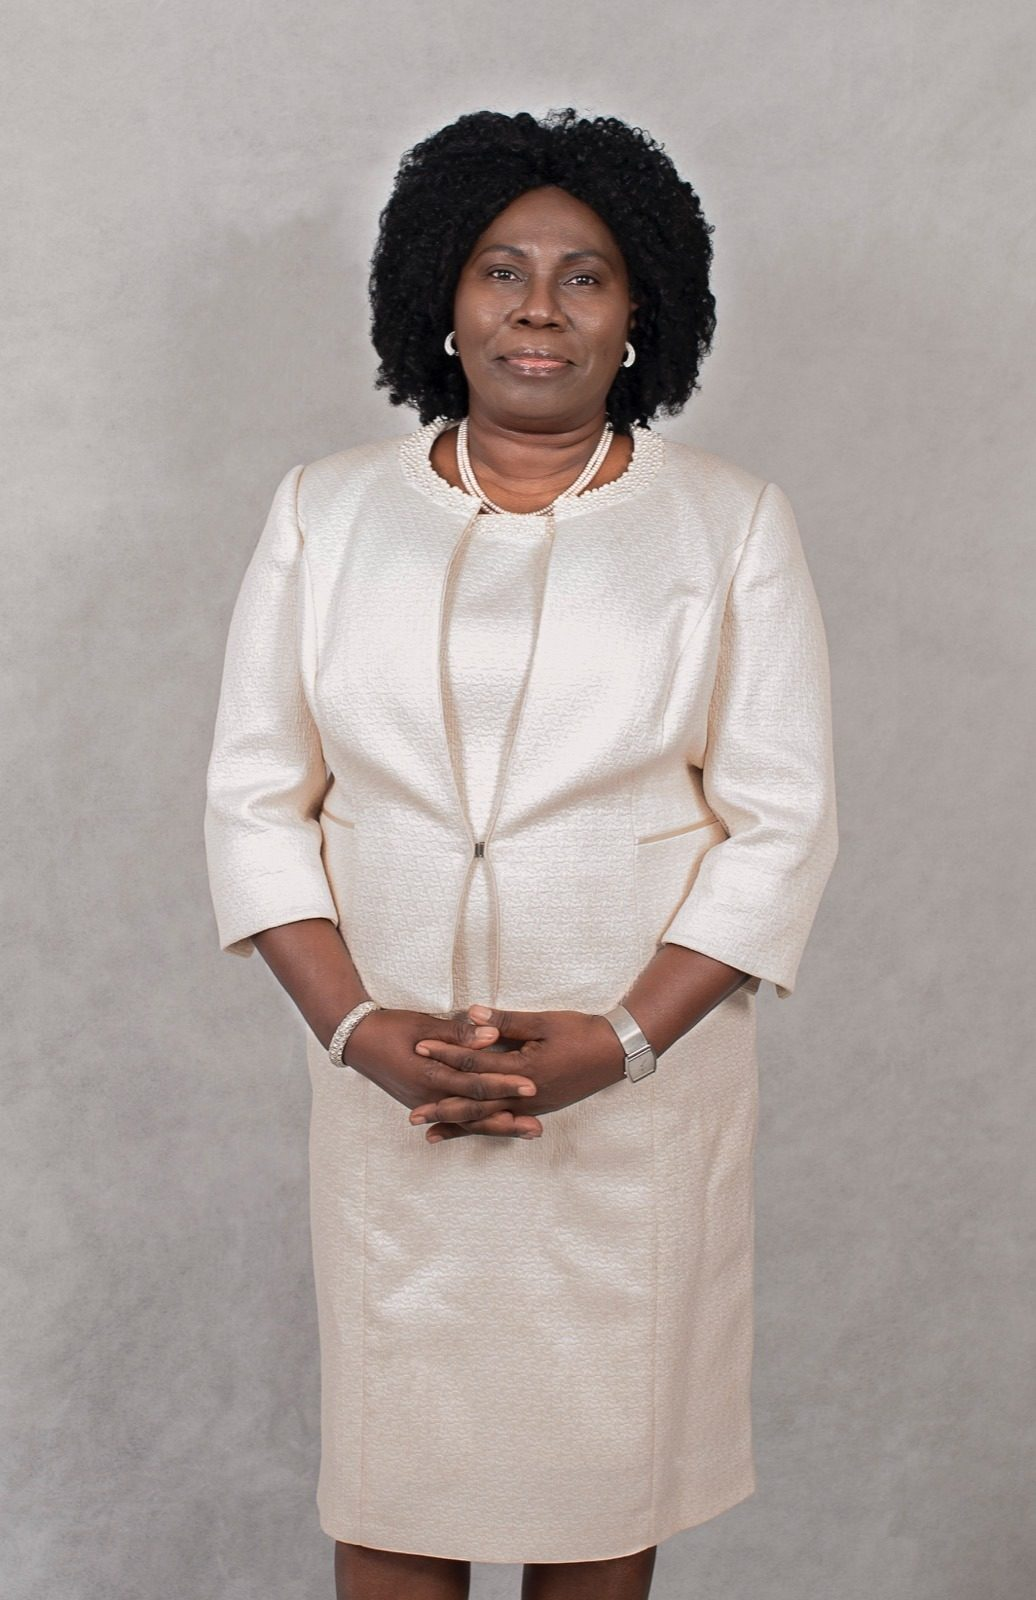 Pastor Helen Ajimati